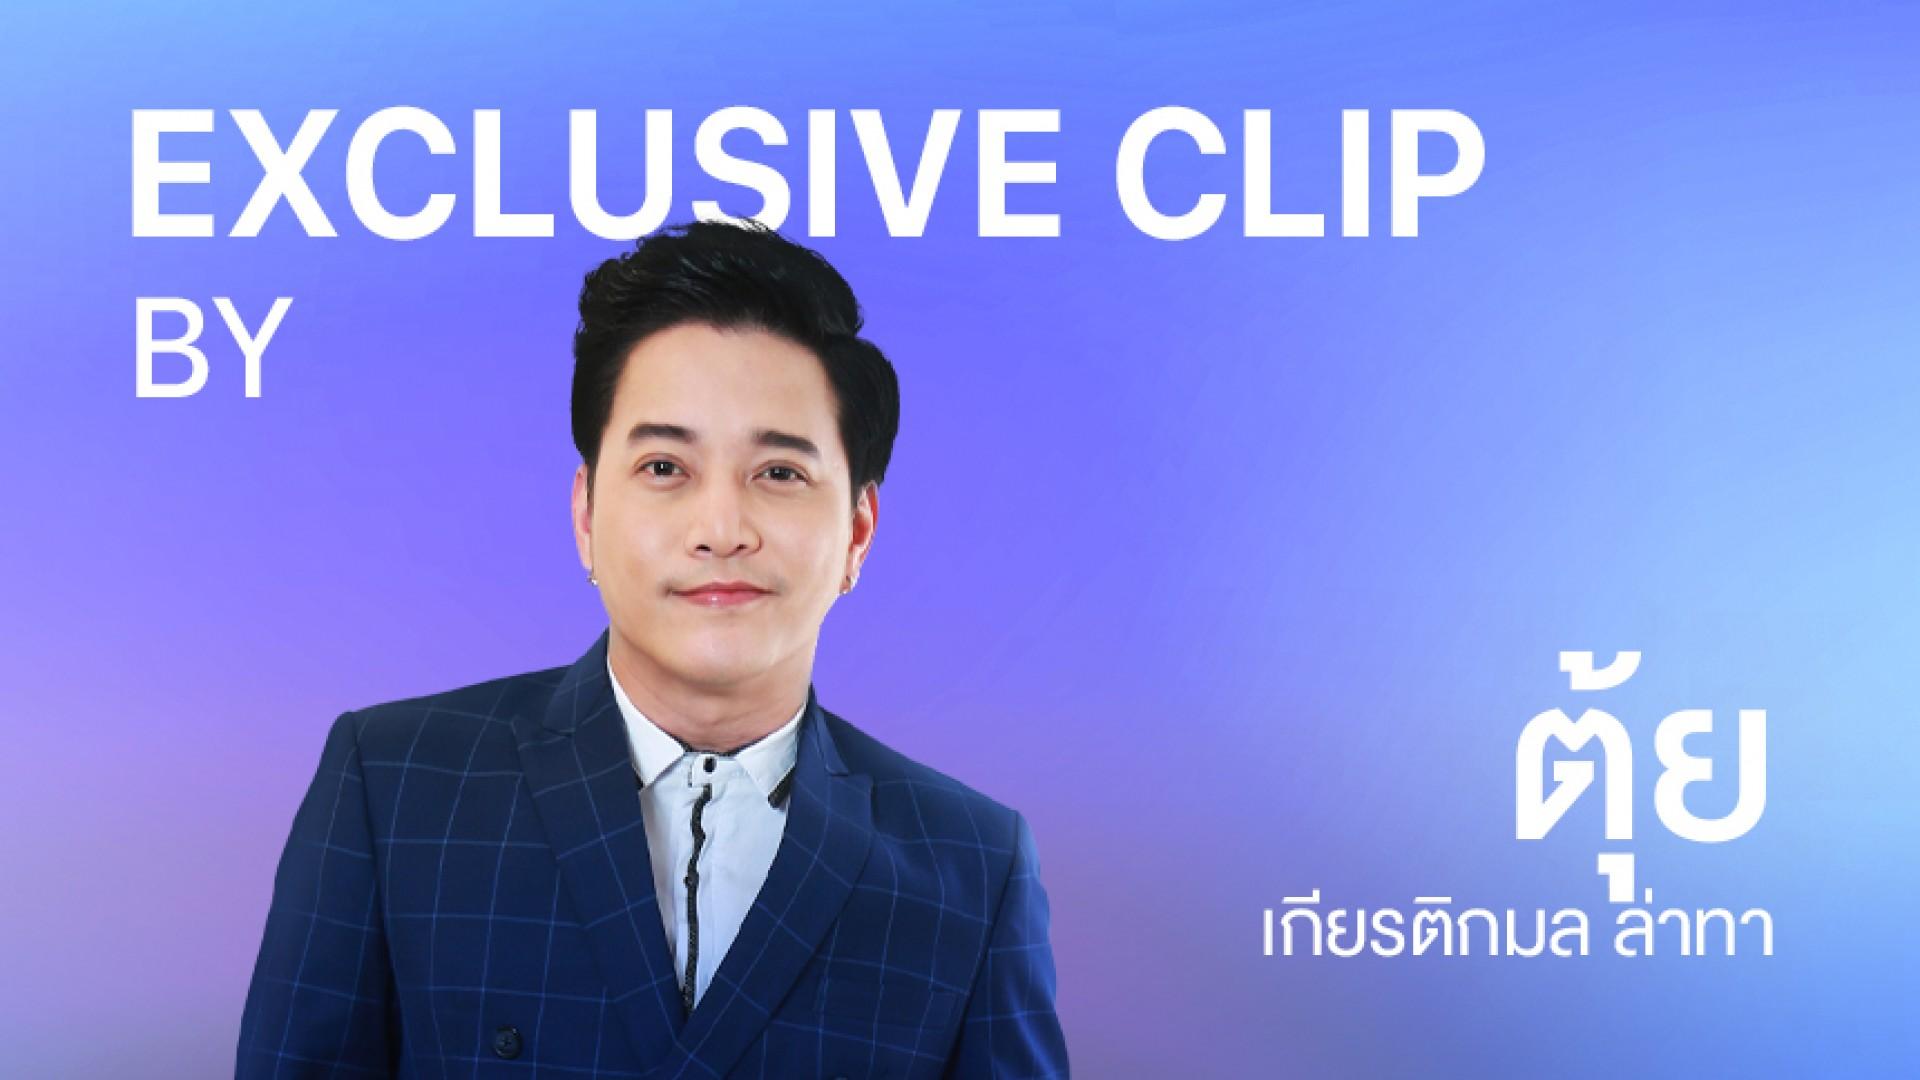 Exclusive clip by ตุ้ย เกียรติกมล